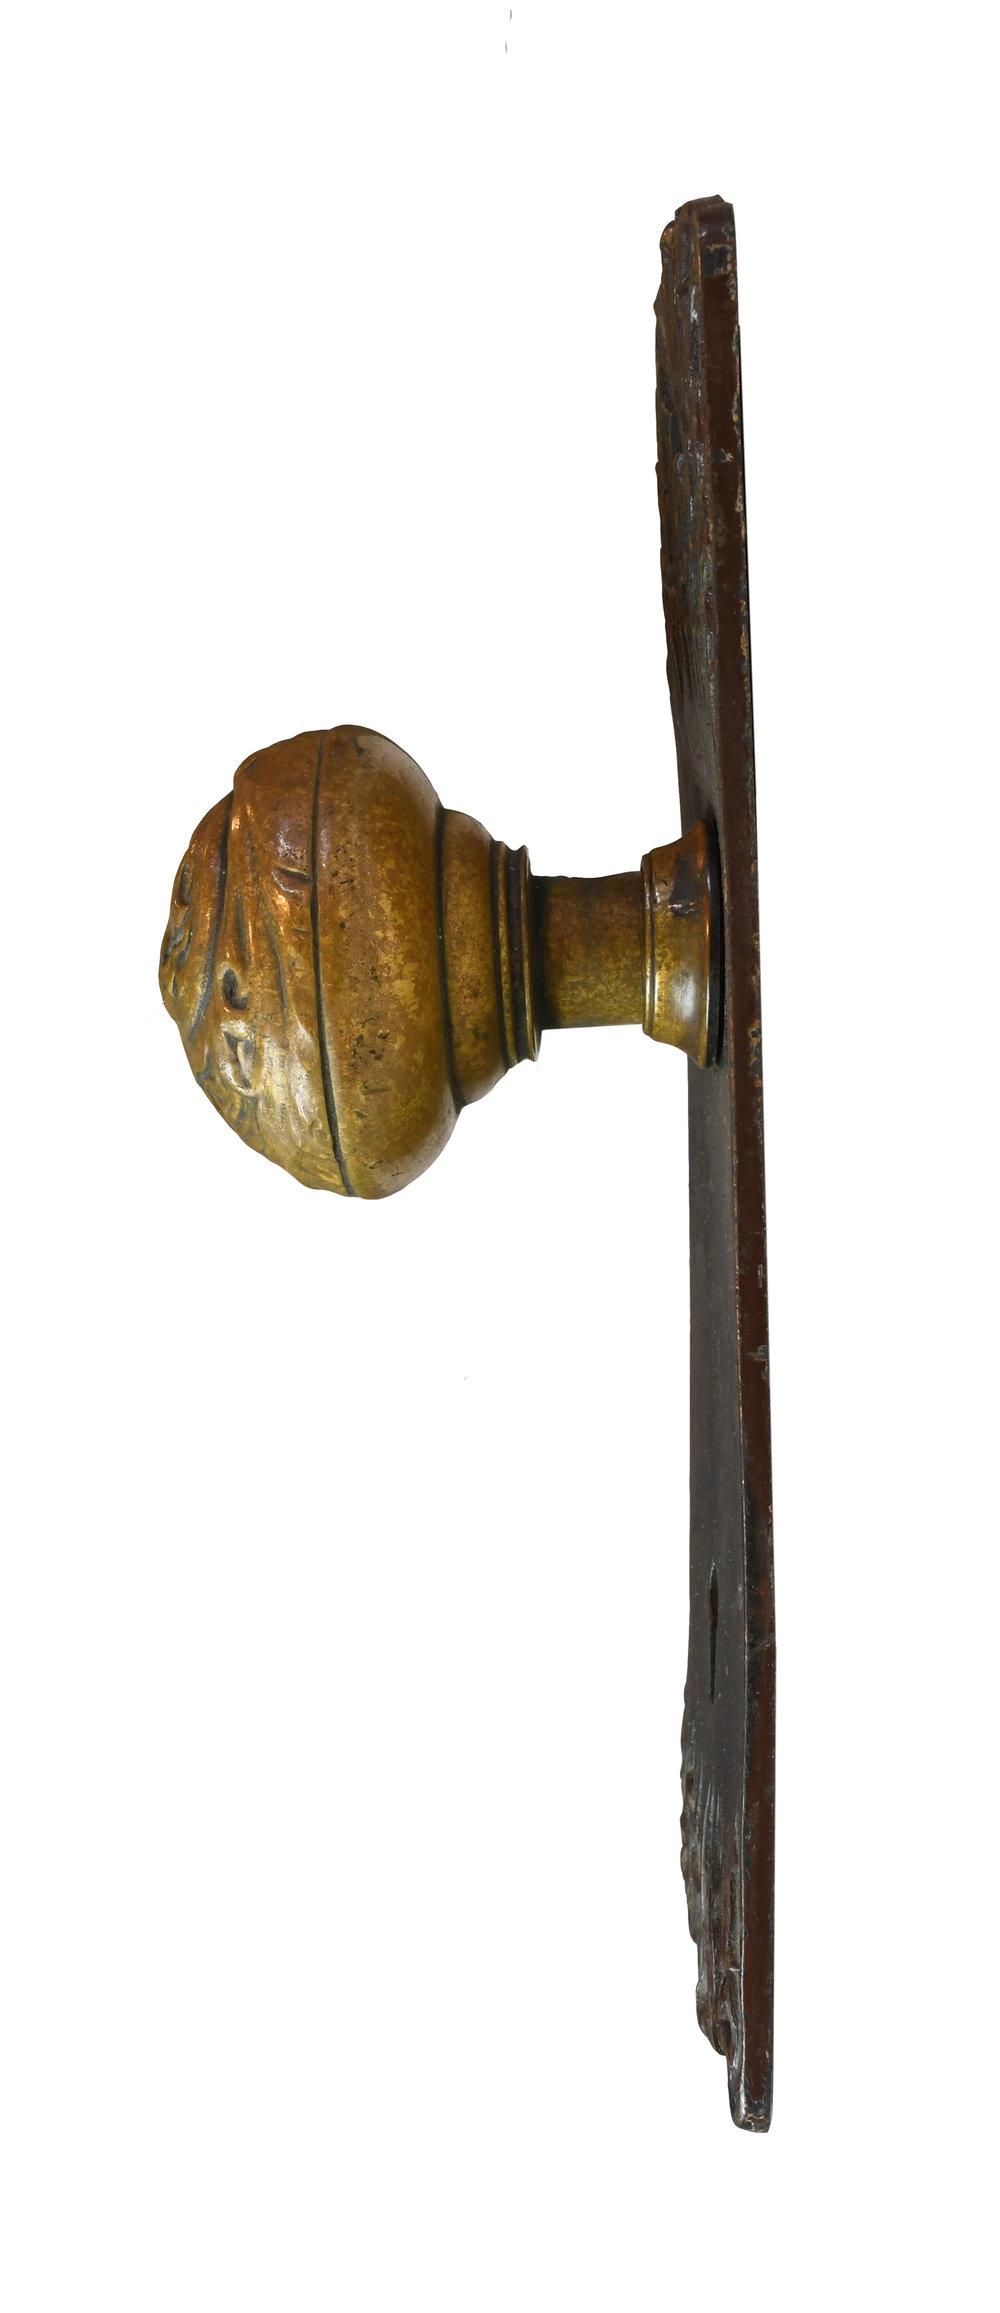 H20169-cast-brass-corbin-florence-door-knob-set-small-7.jpg